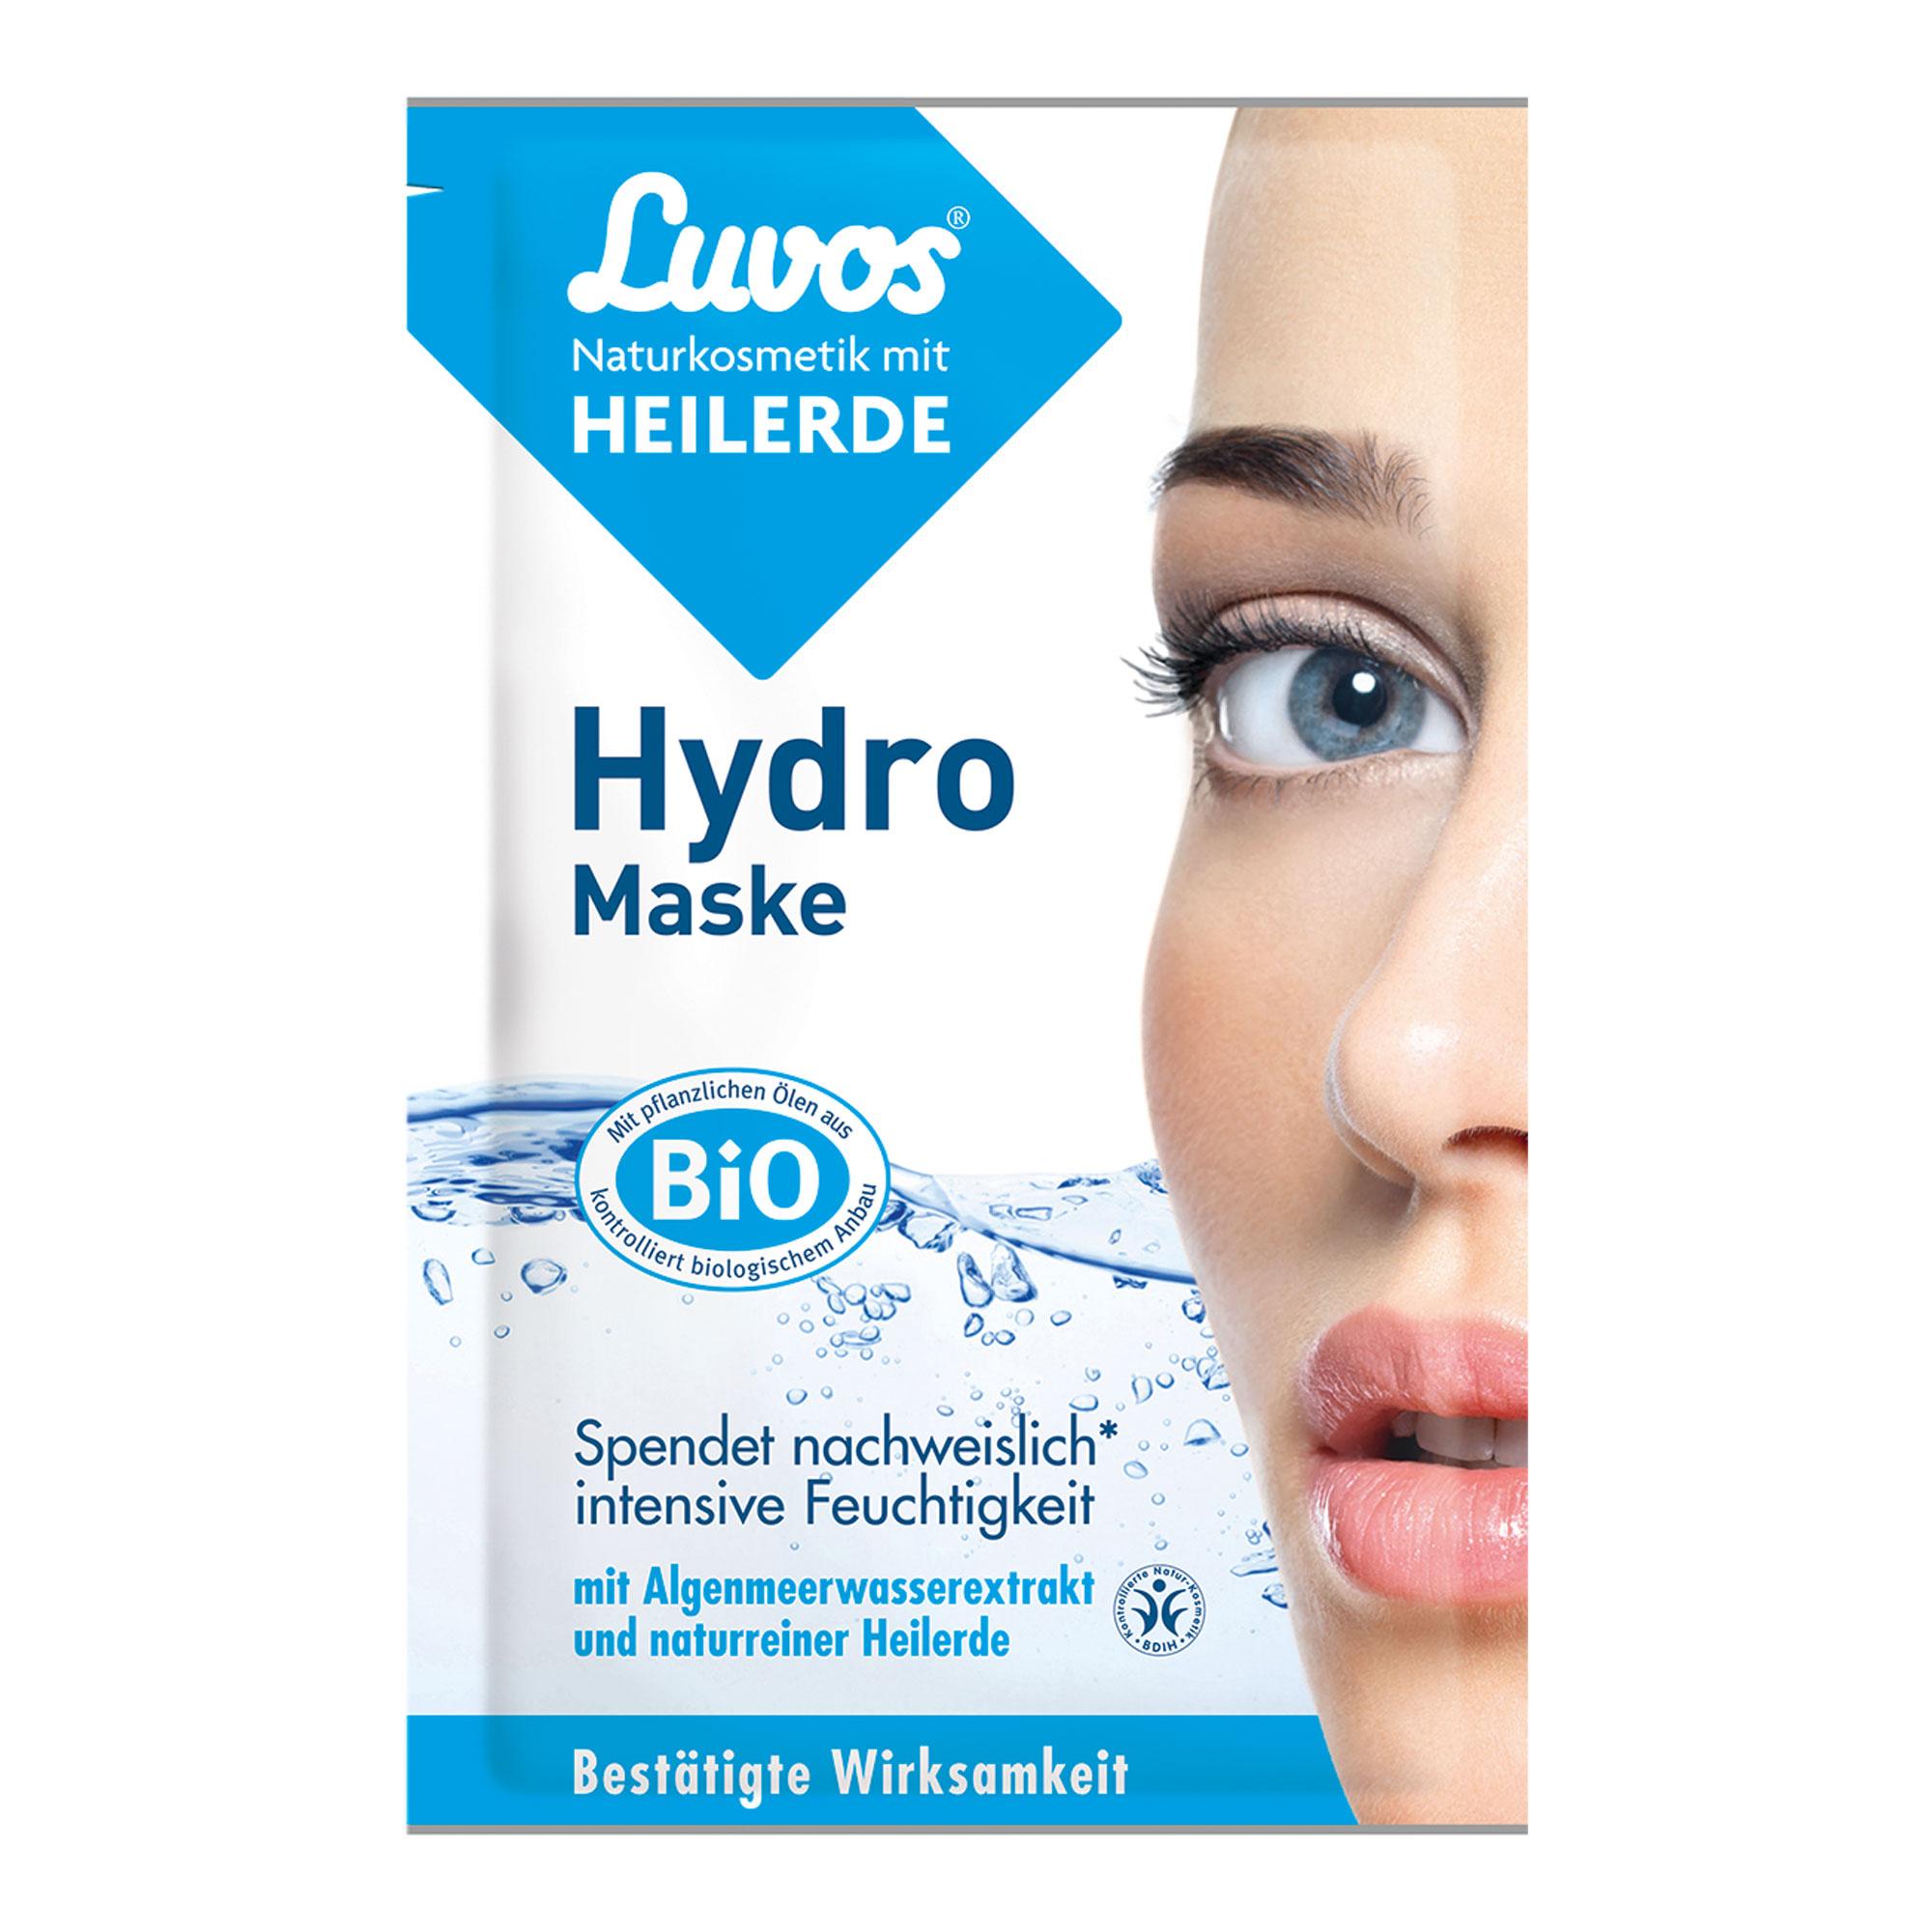 Luvos Naturkosmetik Heilerde Hydro Maske